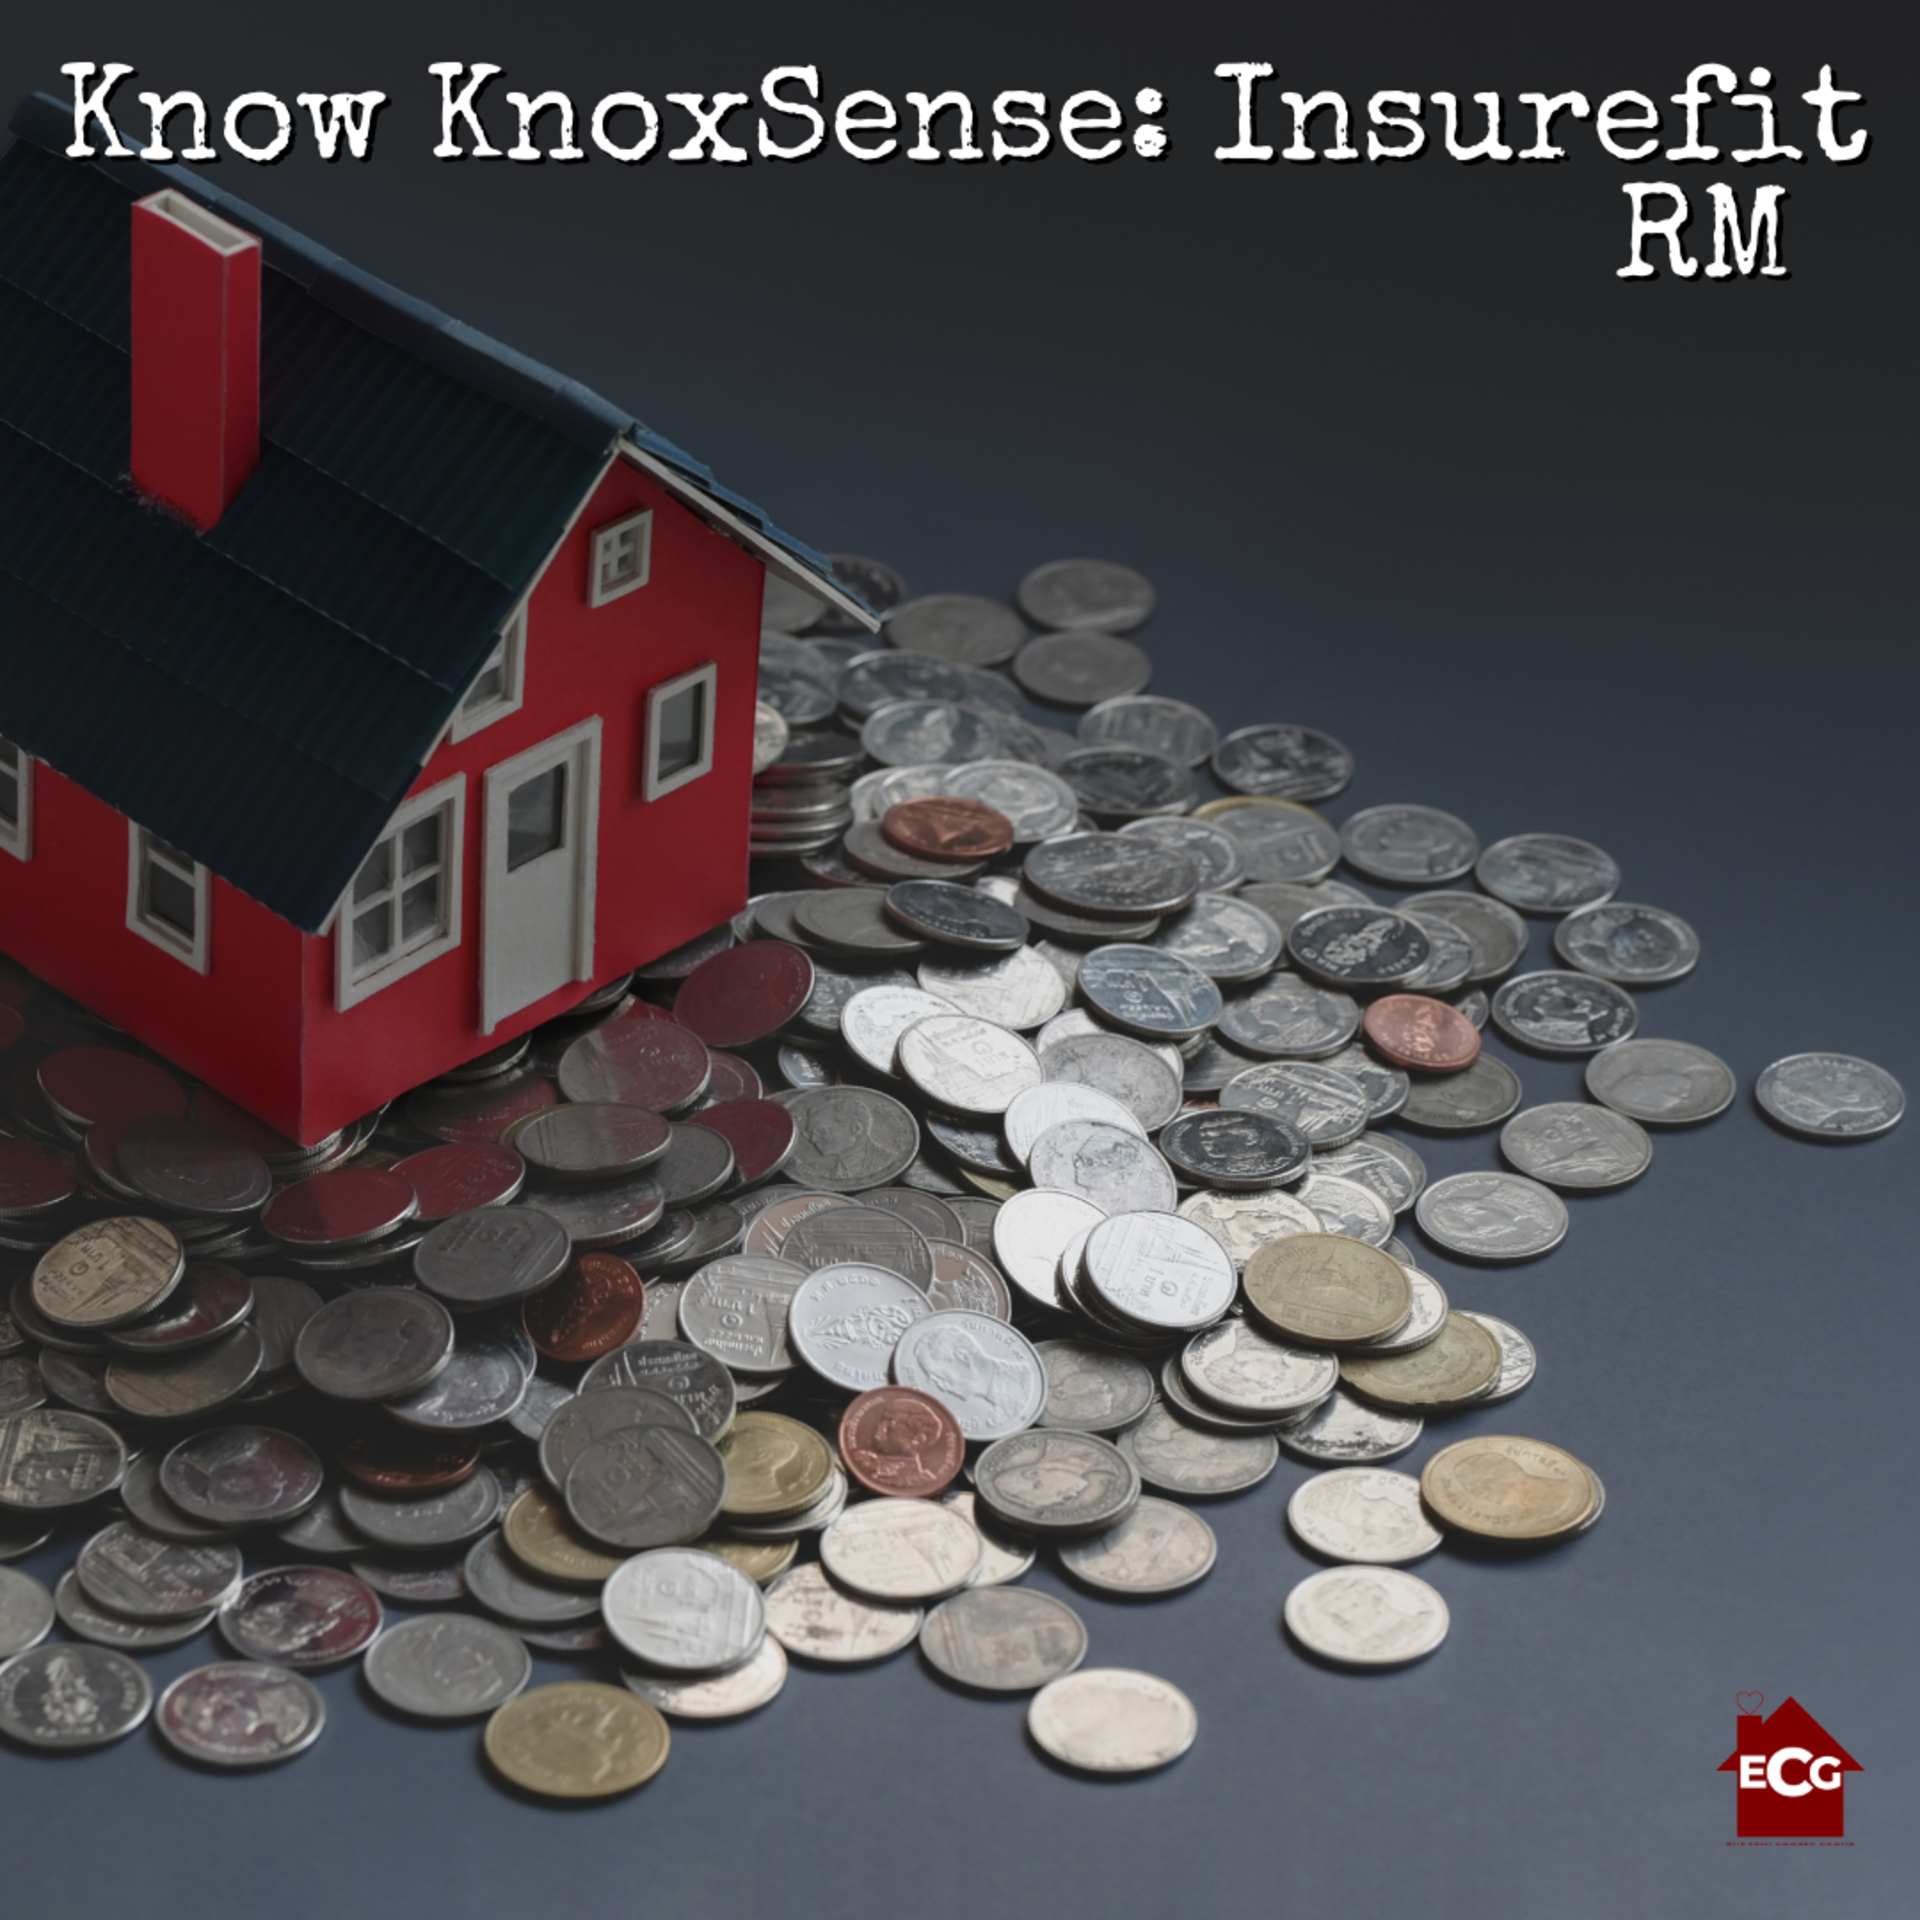 Know Knoxsense: Insurefit RM